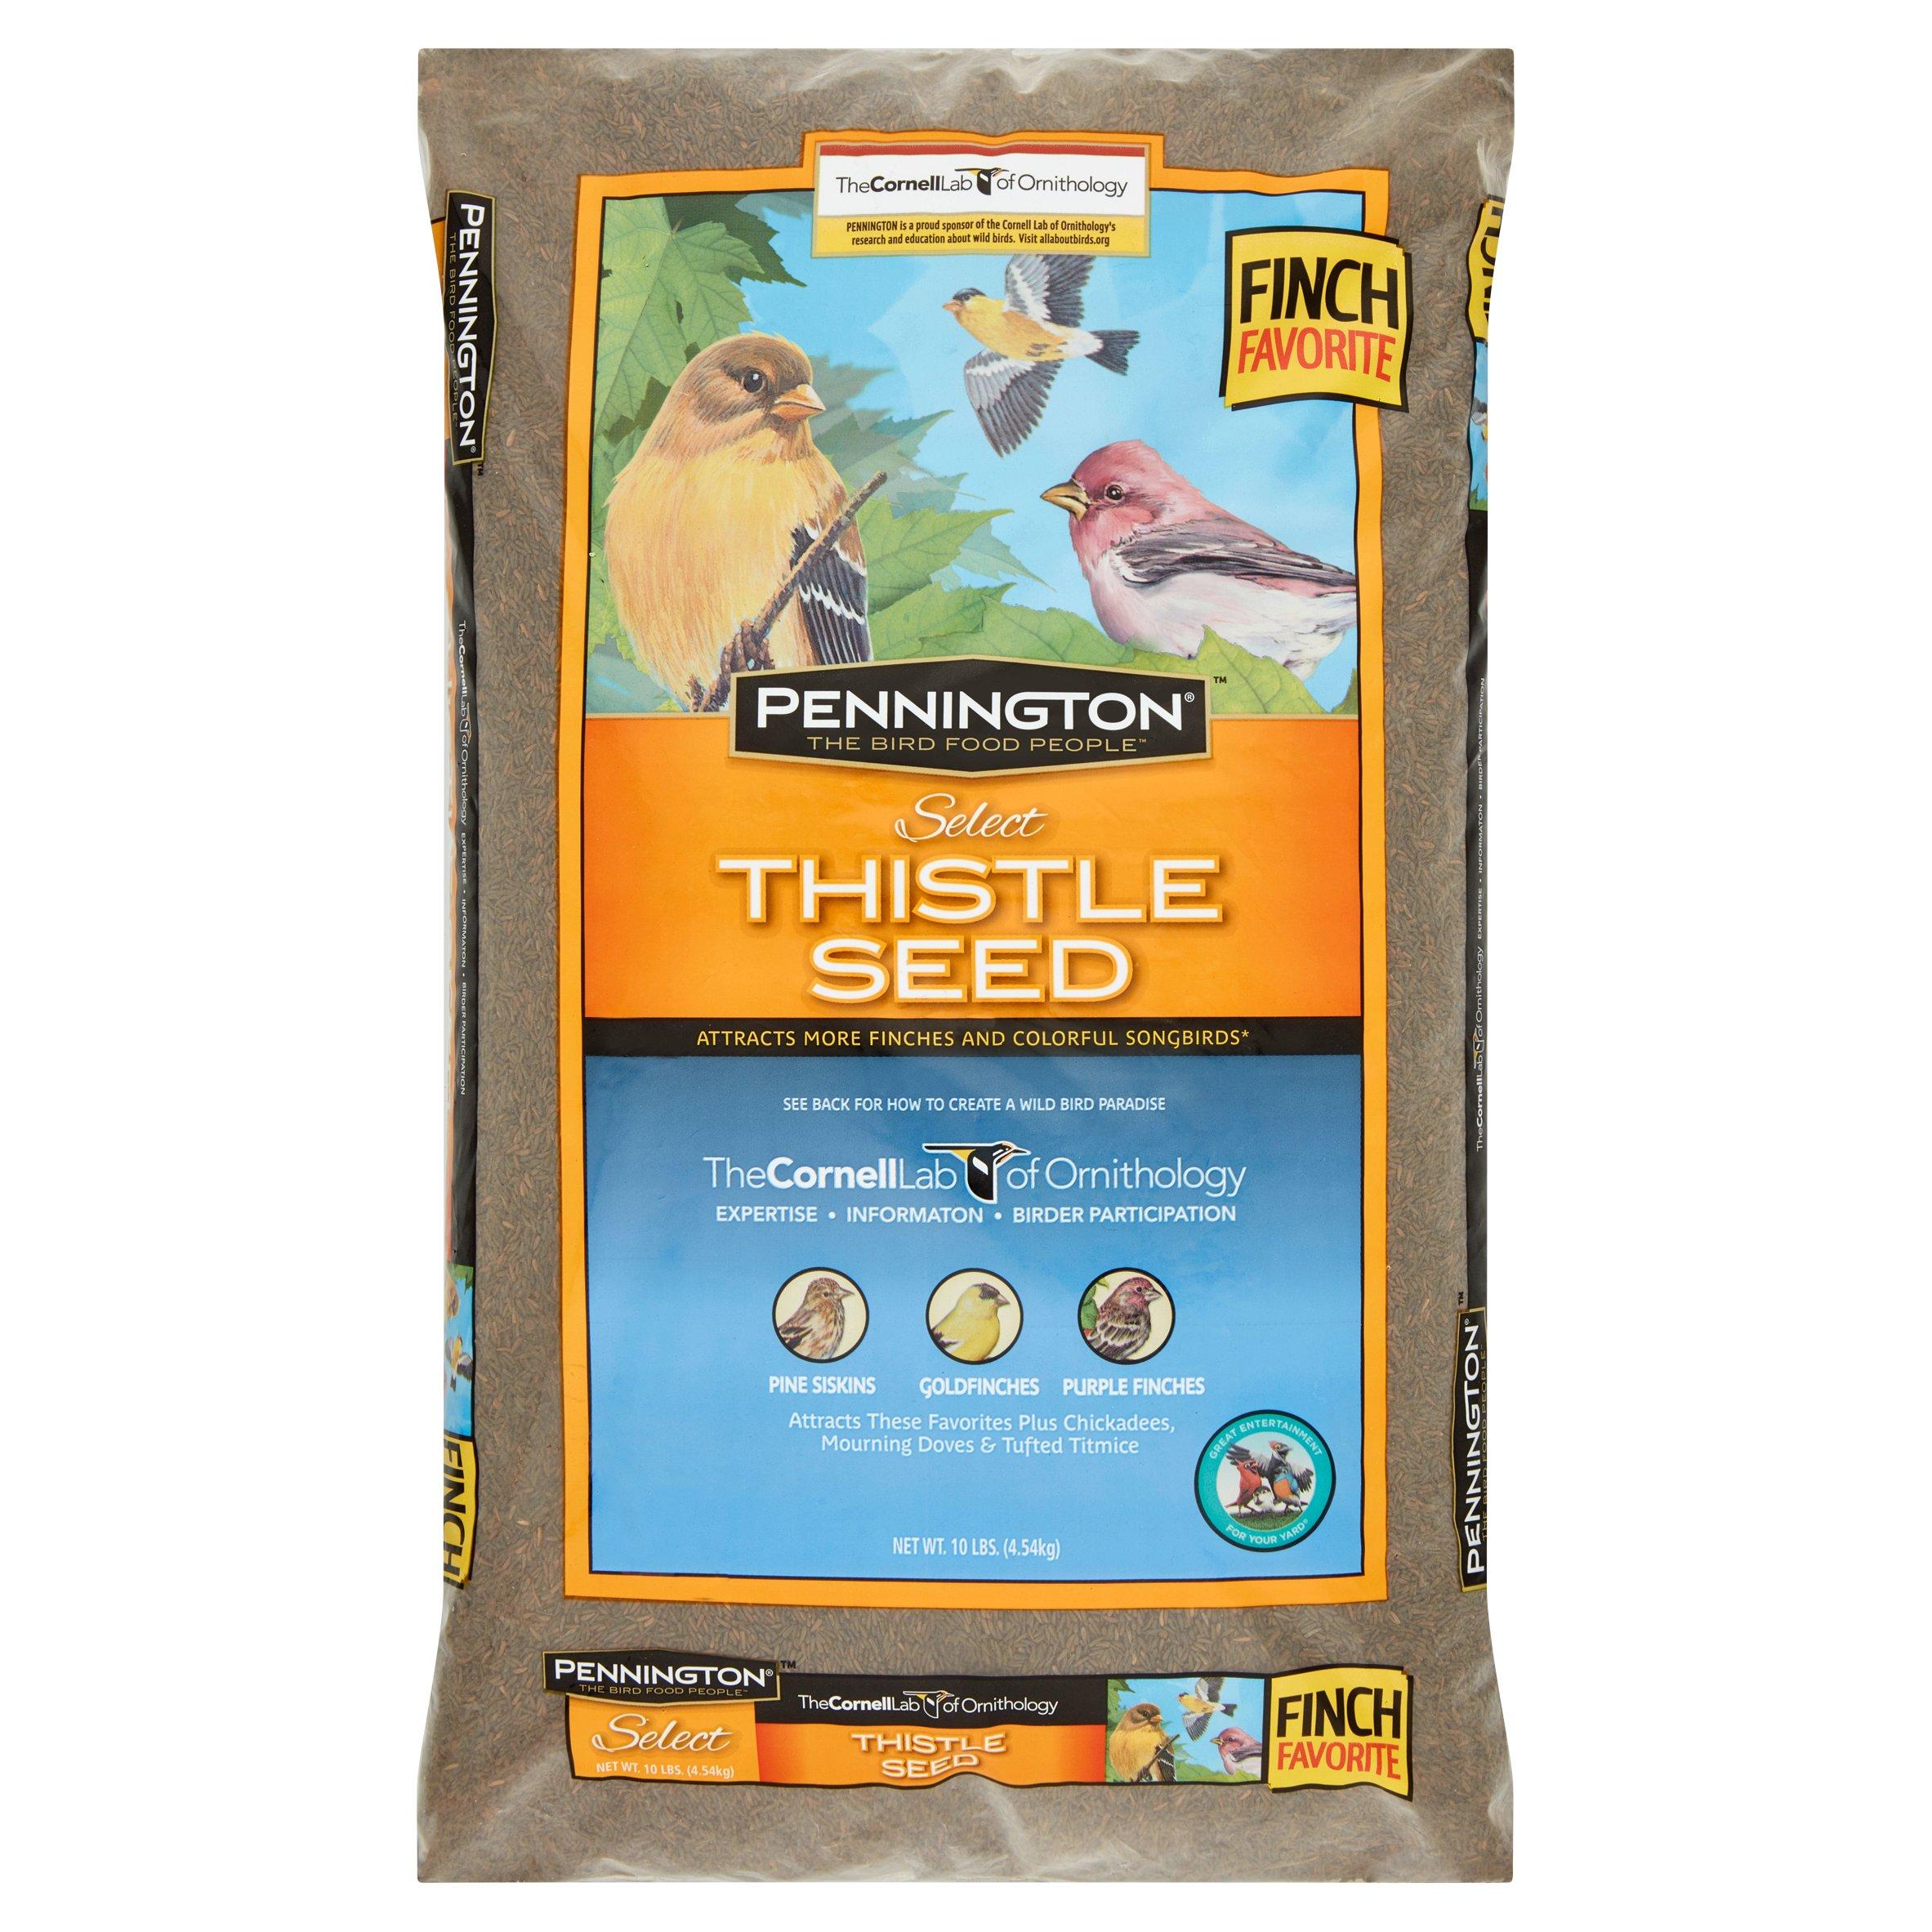 Pennington Thistle Seed Wild Bird Feed and Seed, 10 lbs